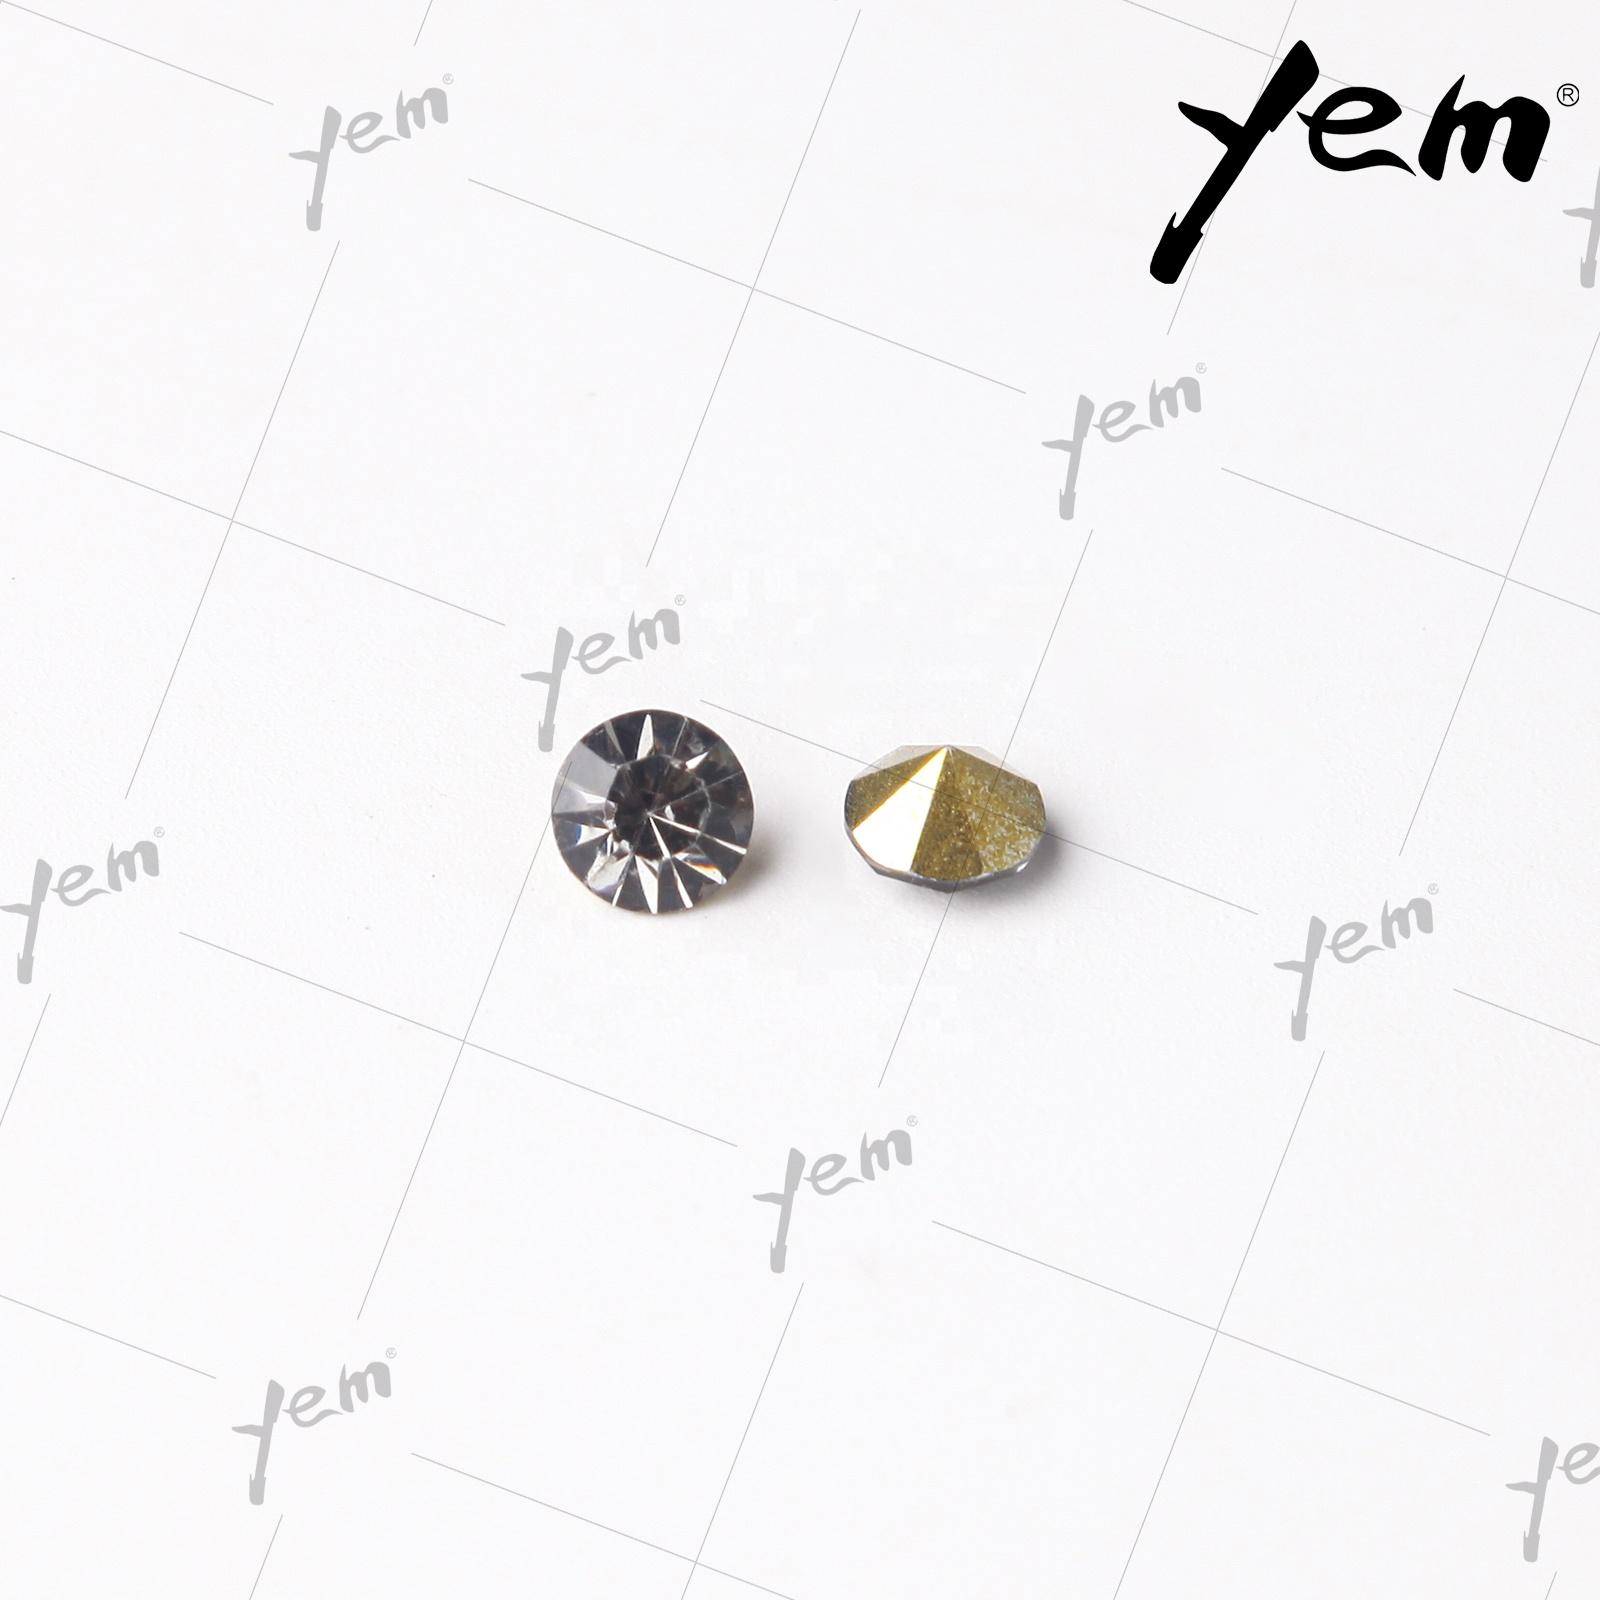 Кристаллы YEM, горный хрусталь, камень из смолы SS6 SS8 SS10 SS12 SS14 SS16 SS45, заостренная обратная сторона, Необычные горный хрусталь без горячей фиксации